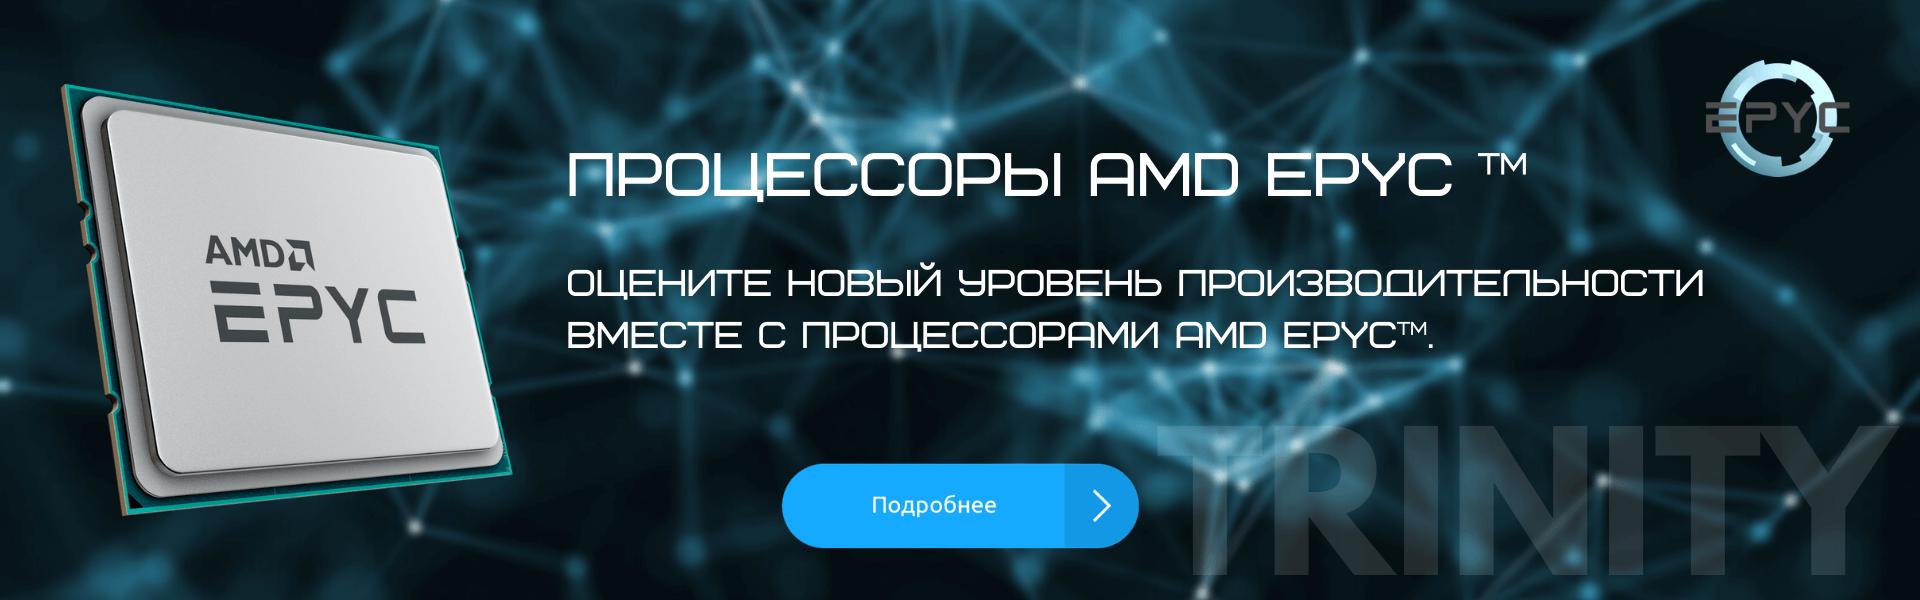 Процессоры AMD EPYC™